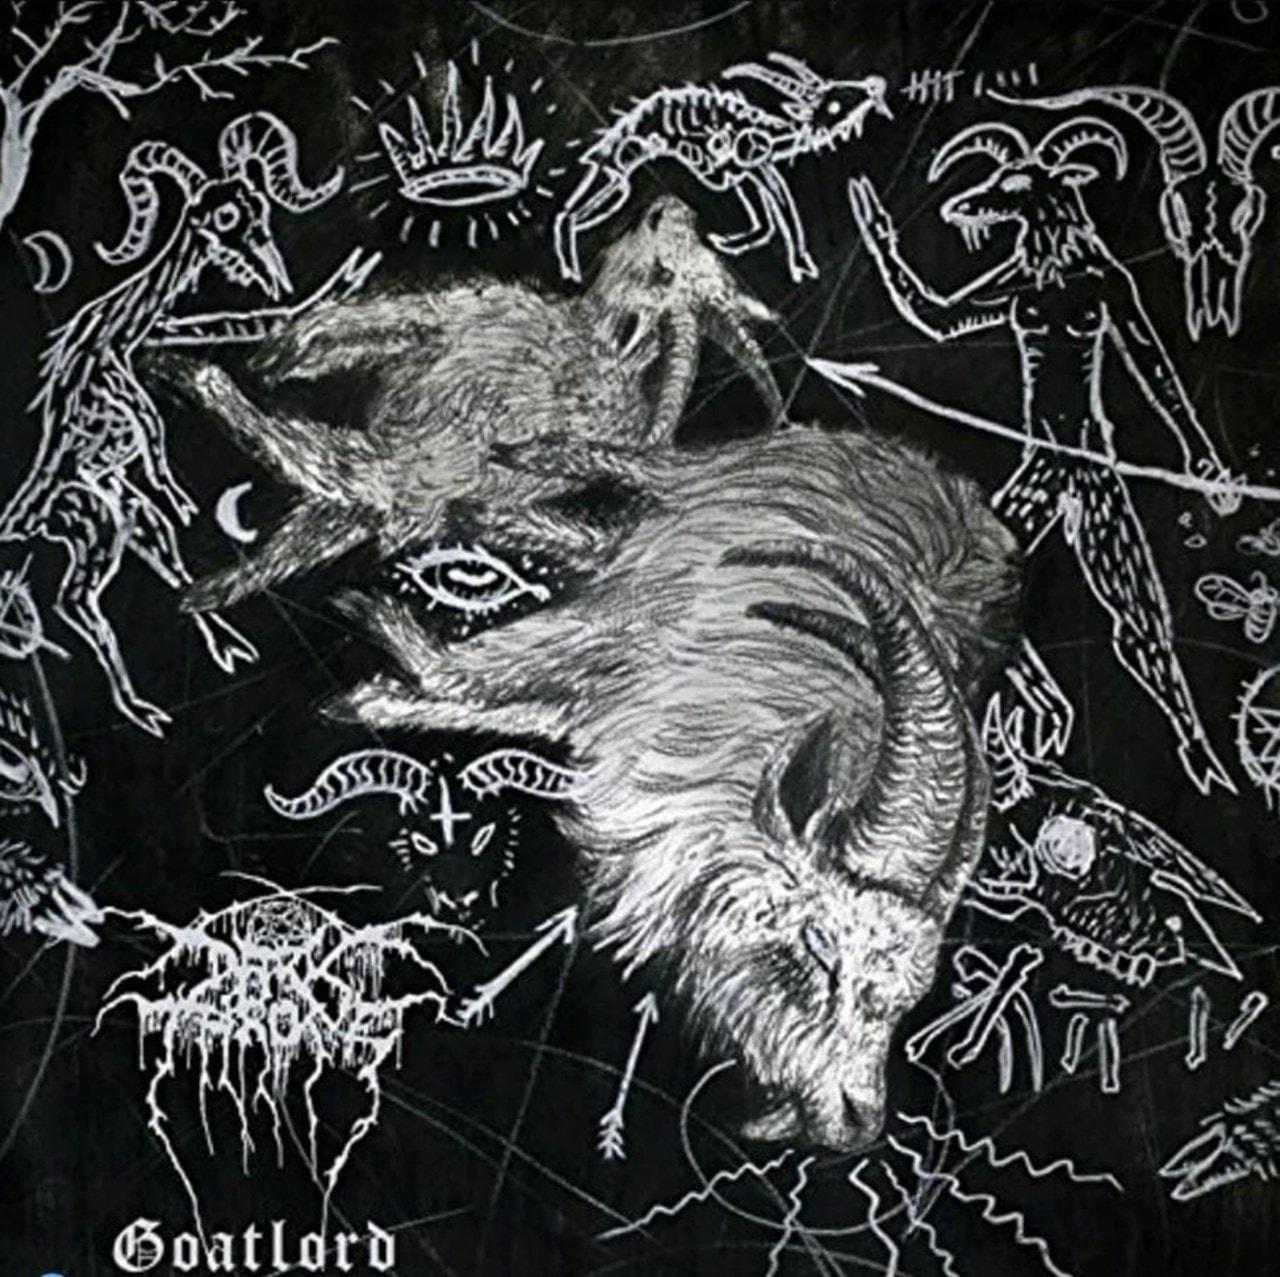 Goatlord - 1